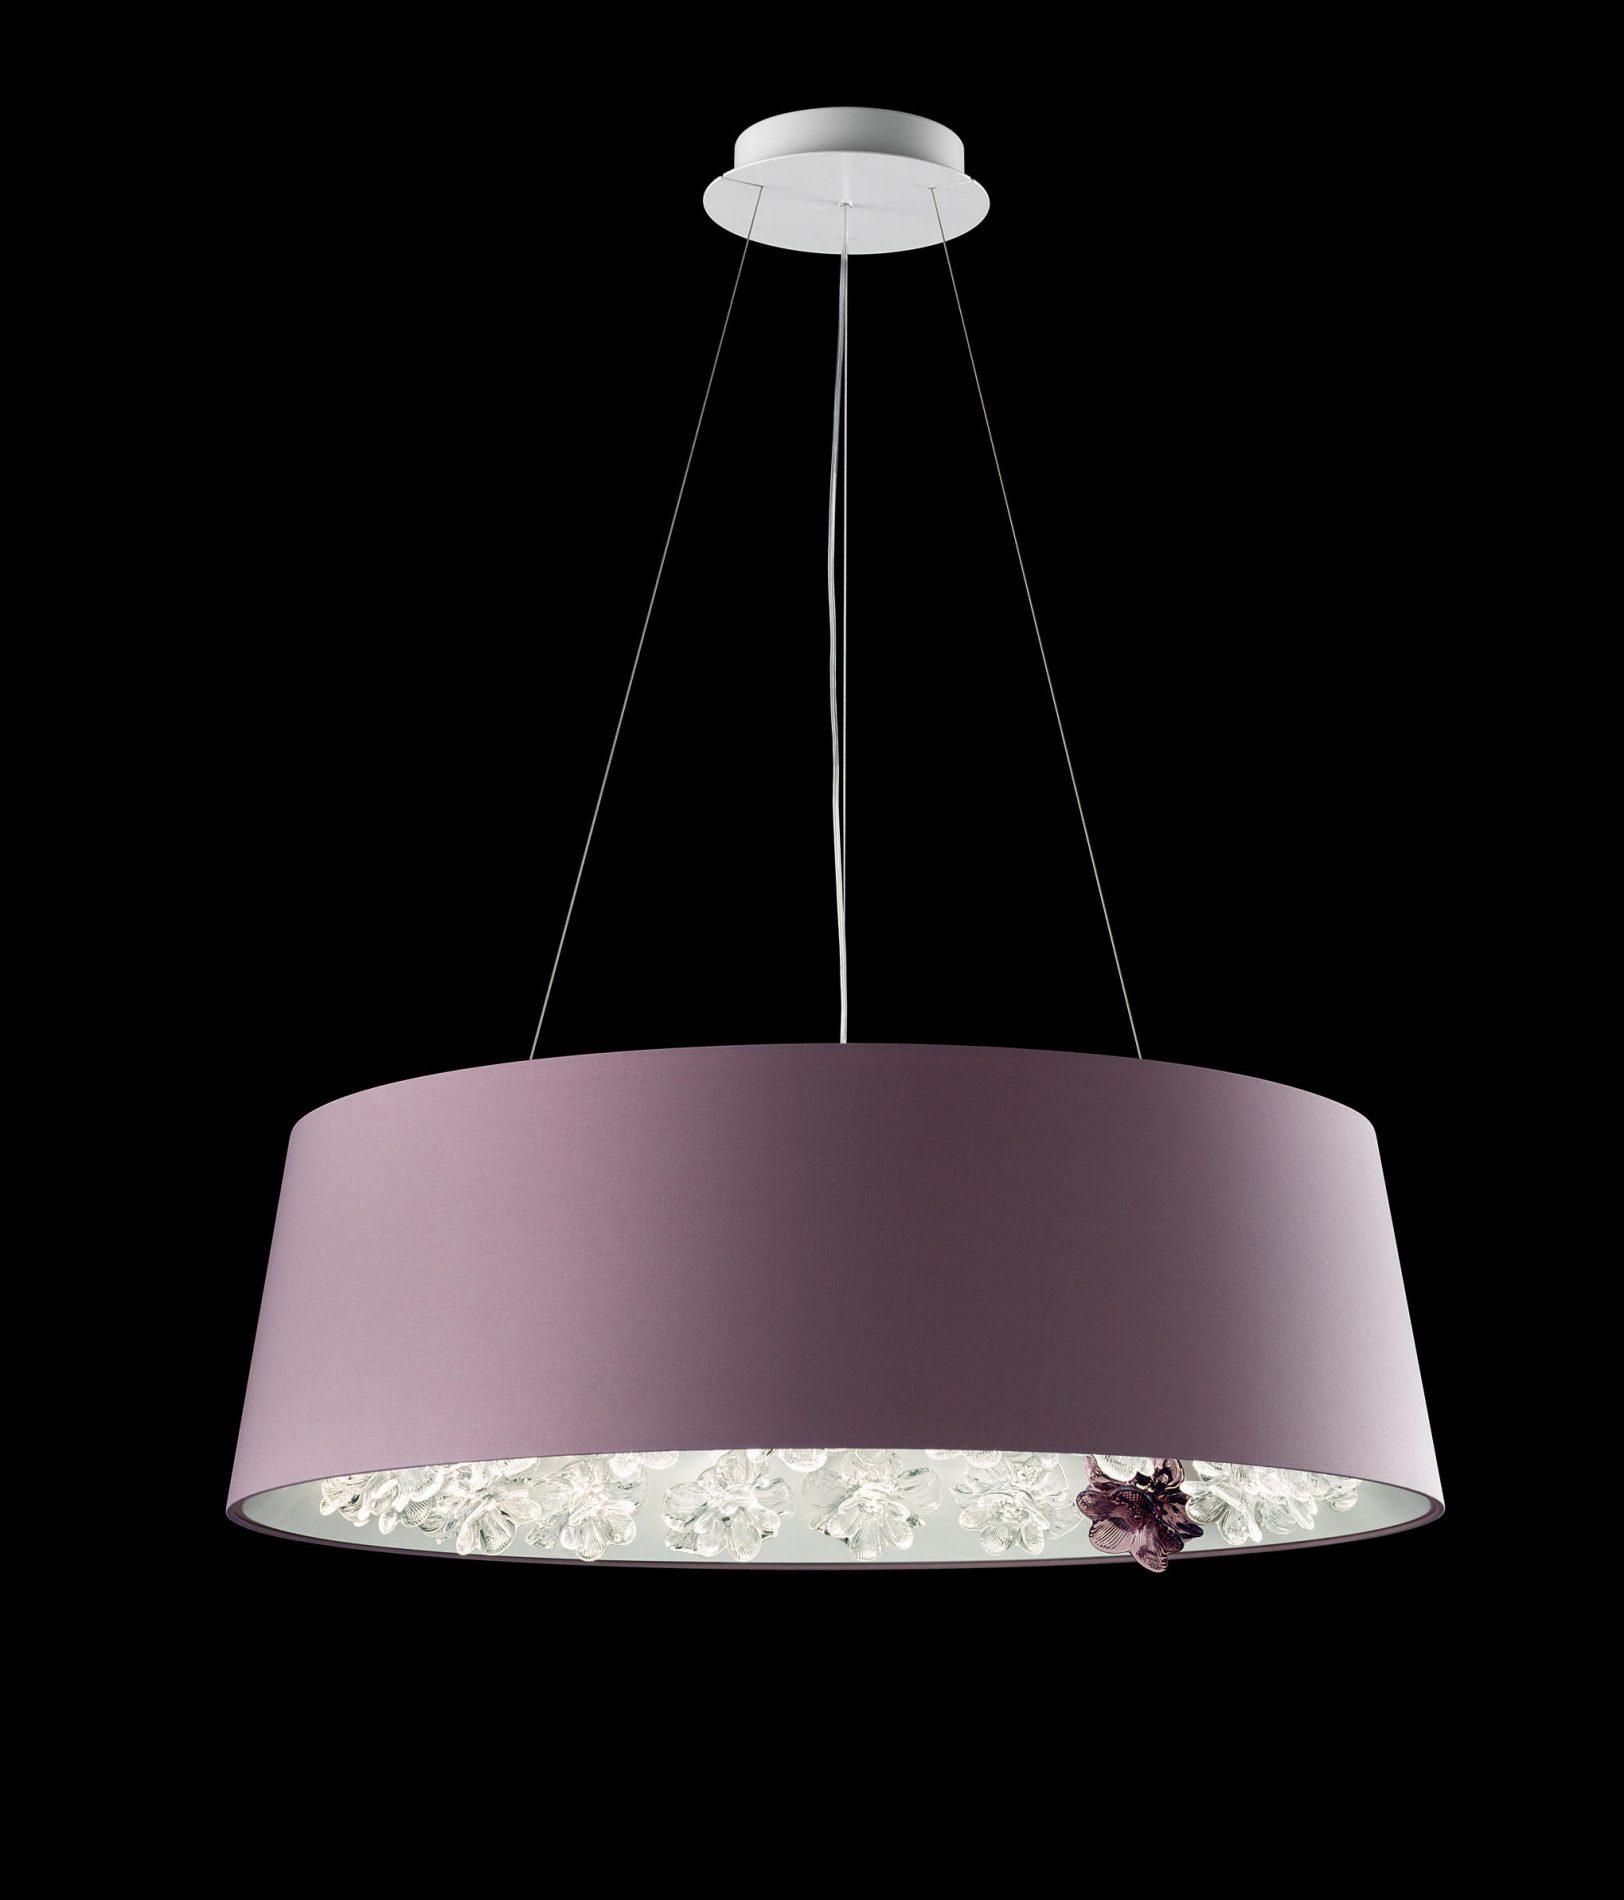 pantone 2018 design, ultraviolet decor, violet chandelier, barovier toso